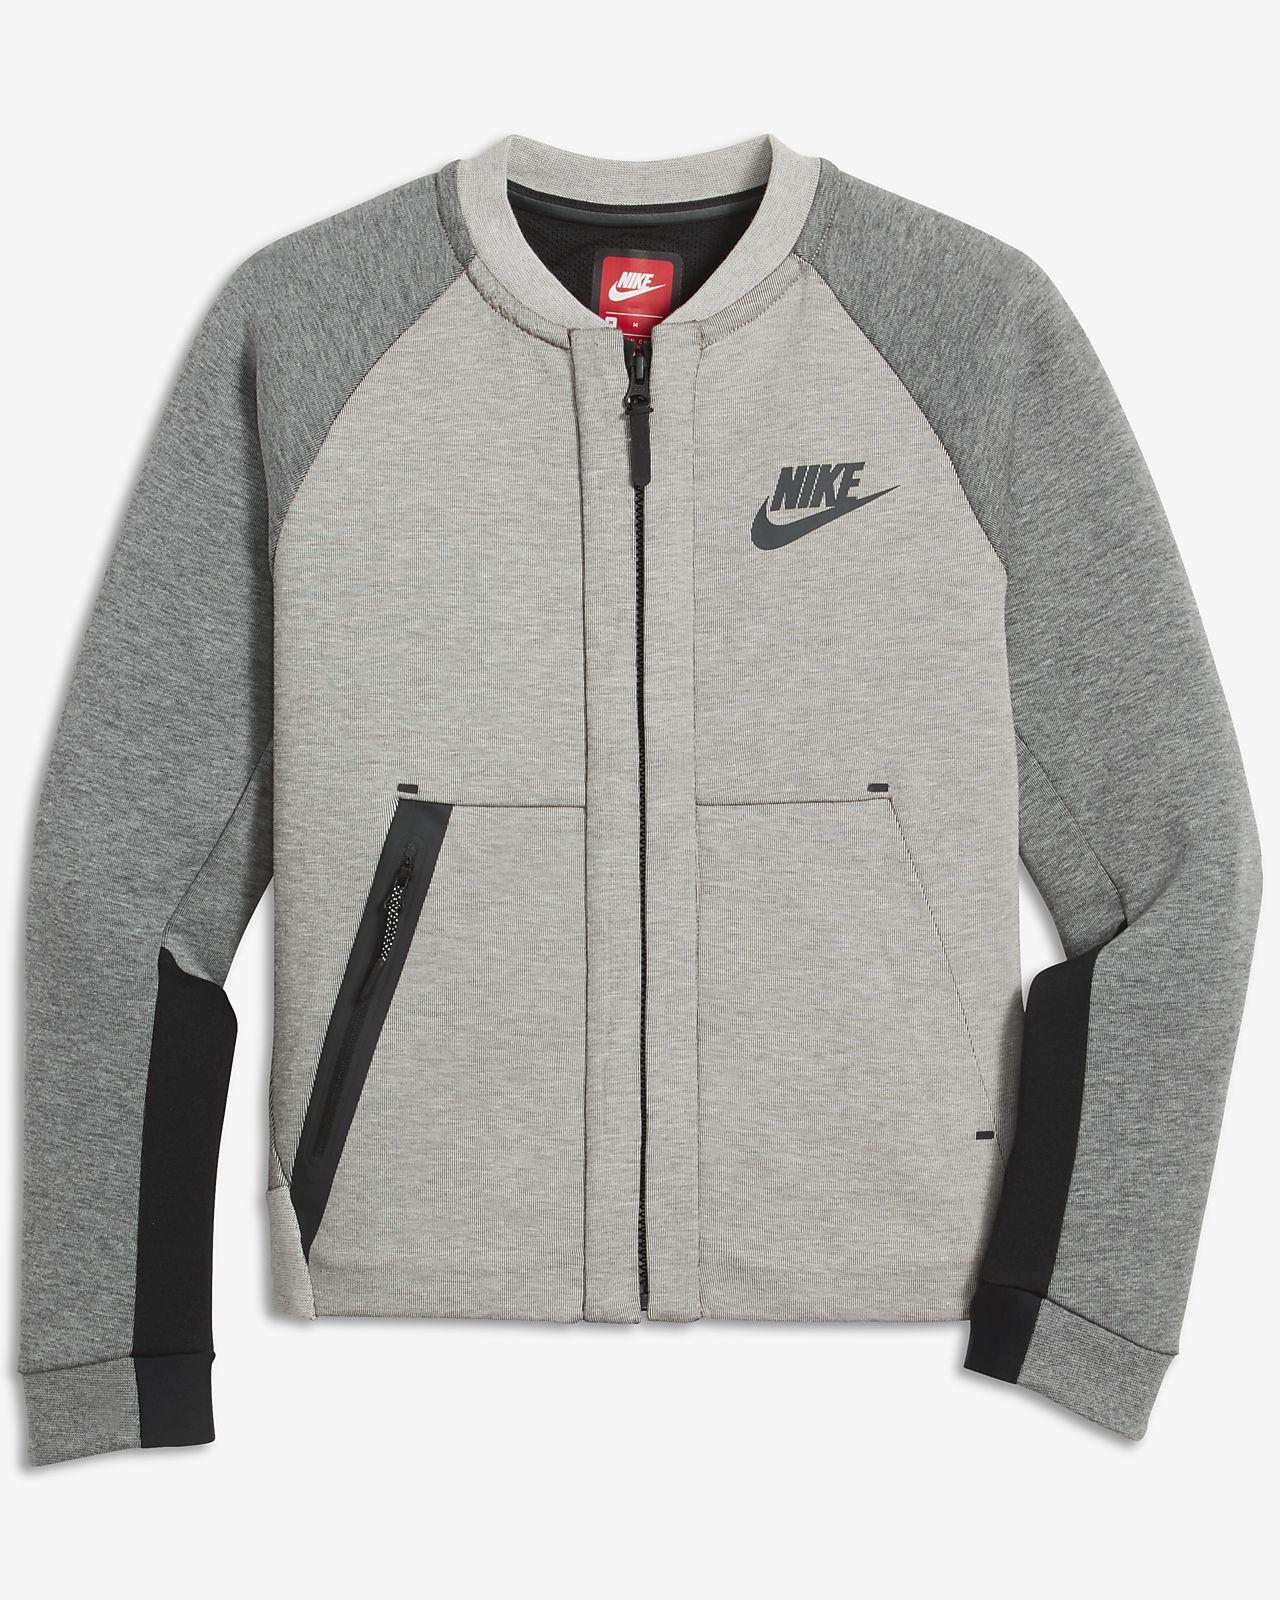 Nike Sportswear Vest Carbon Heather/Anthracite/Black : Dt4763